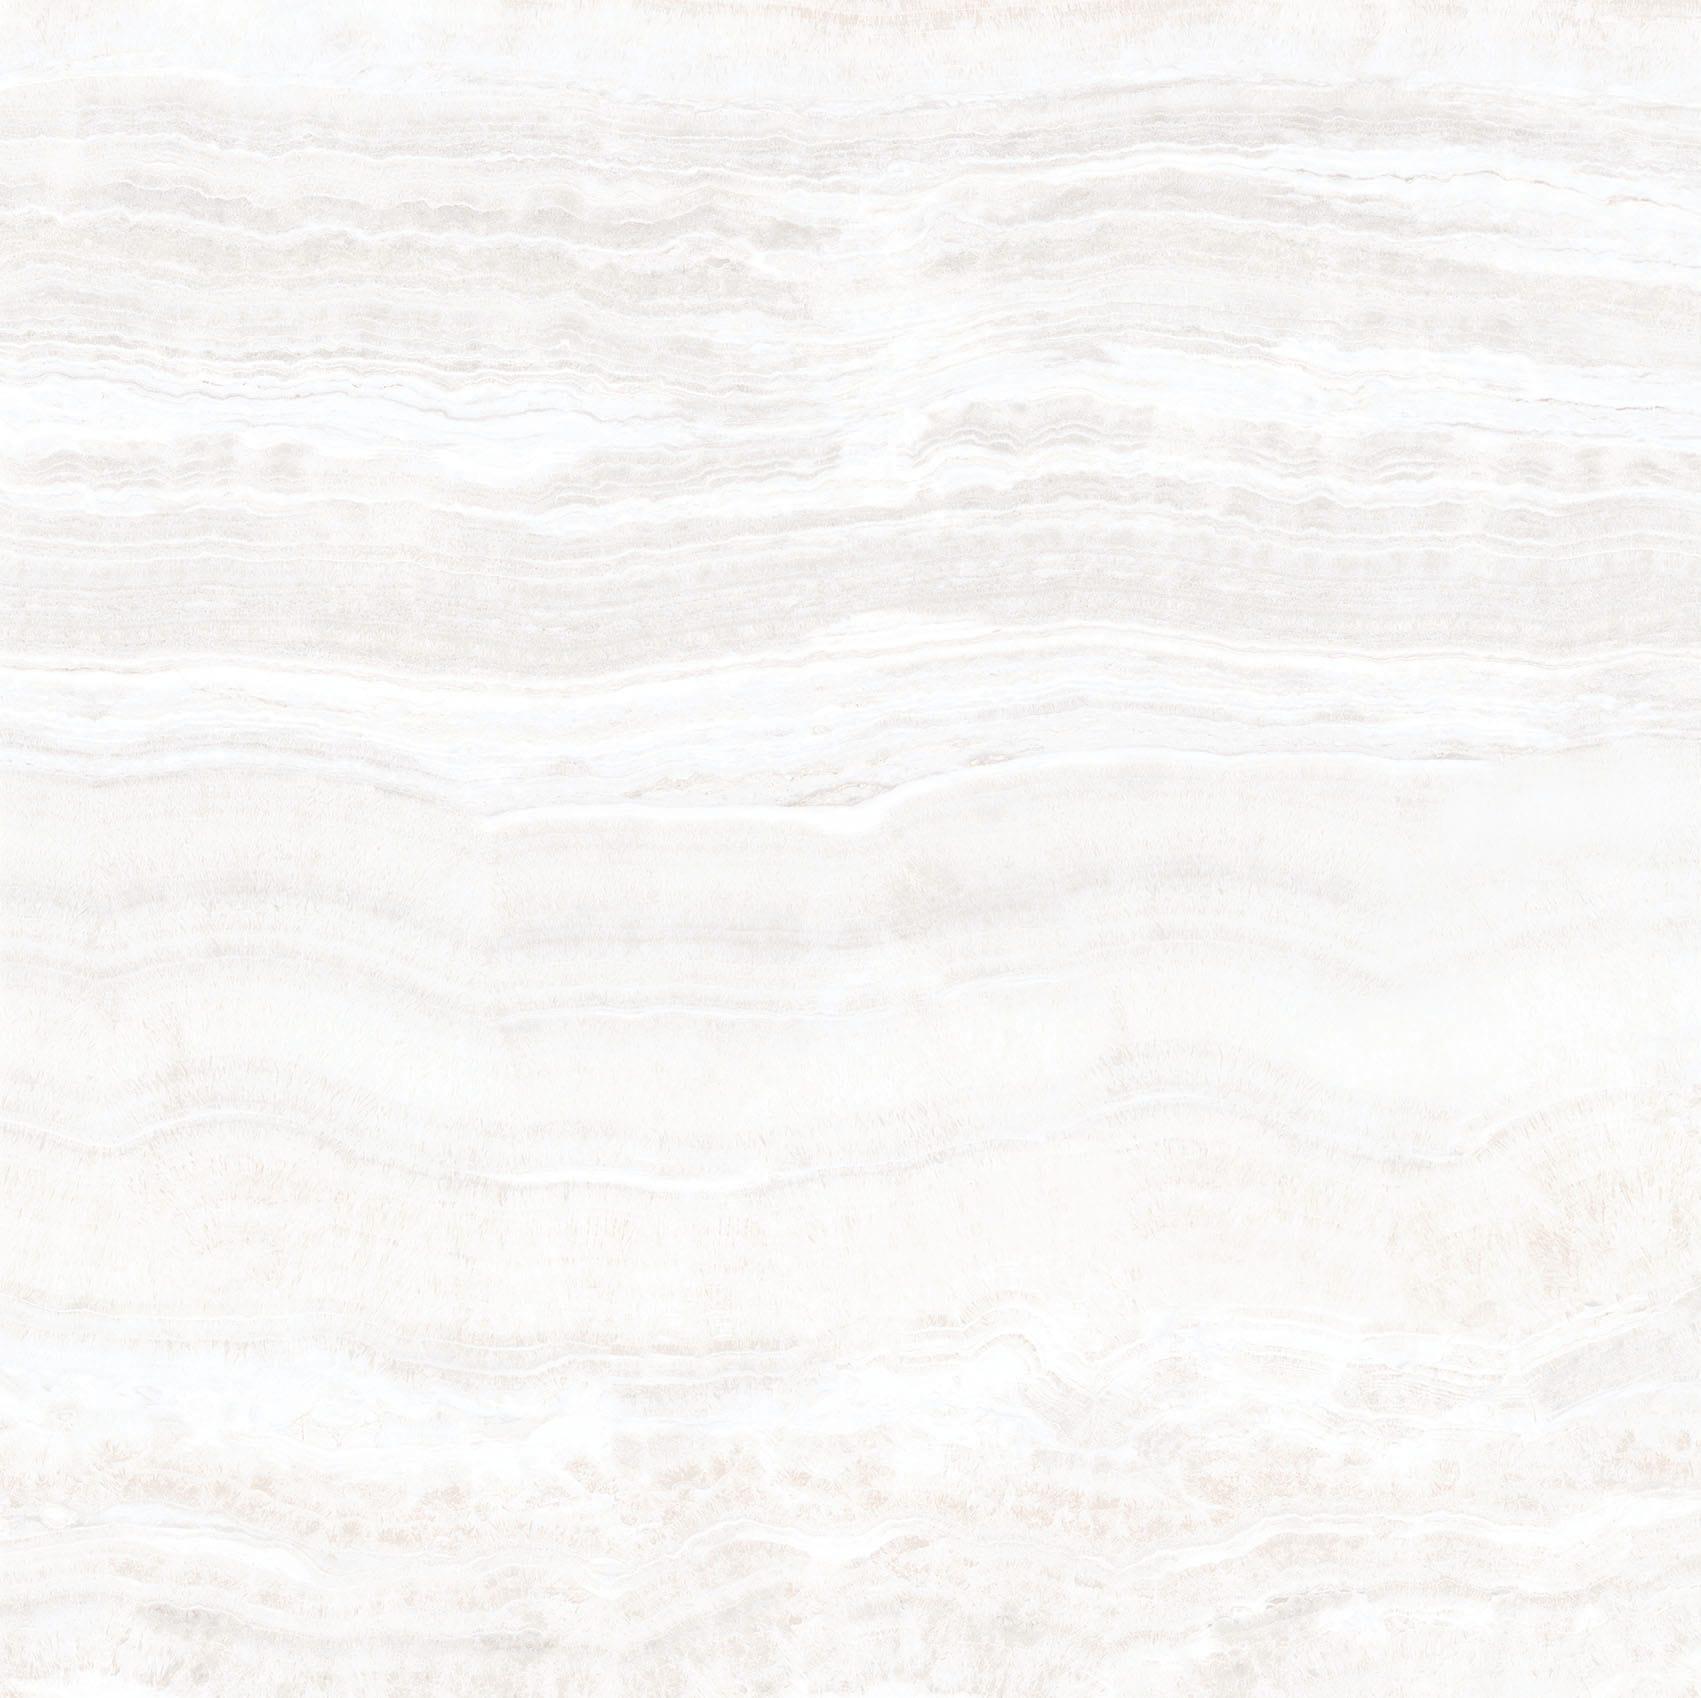 Onyx of Cerim White Glossy 10mm 60 x 60